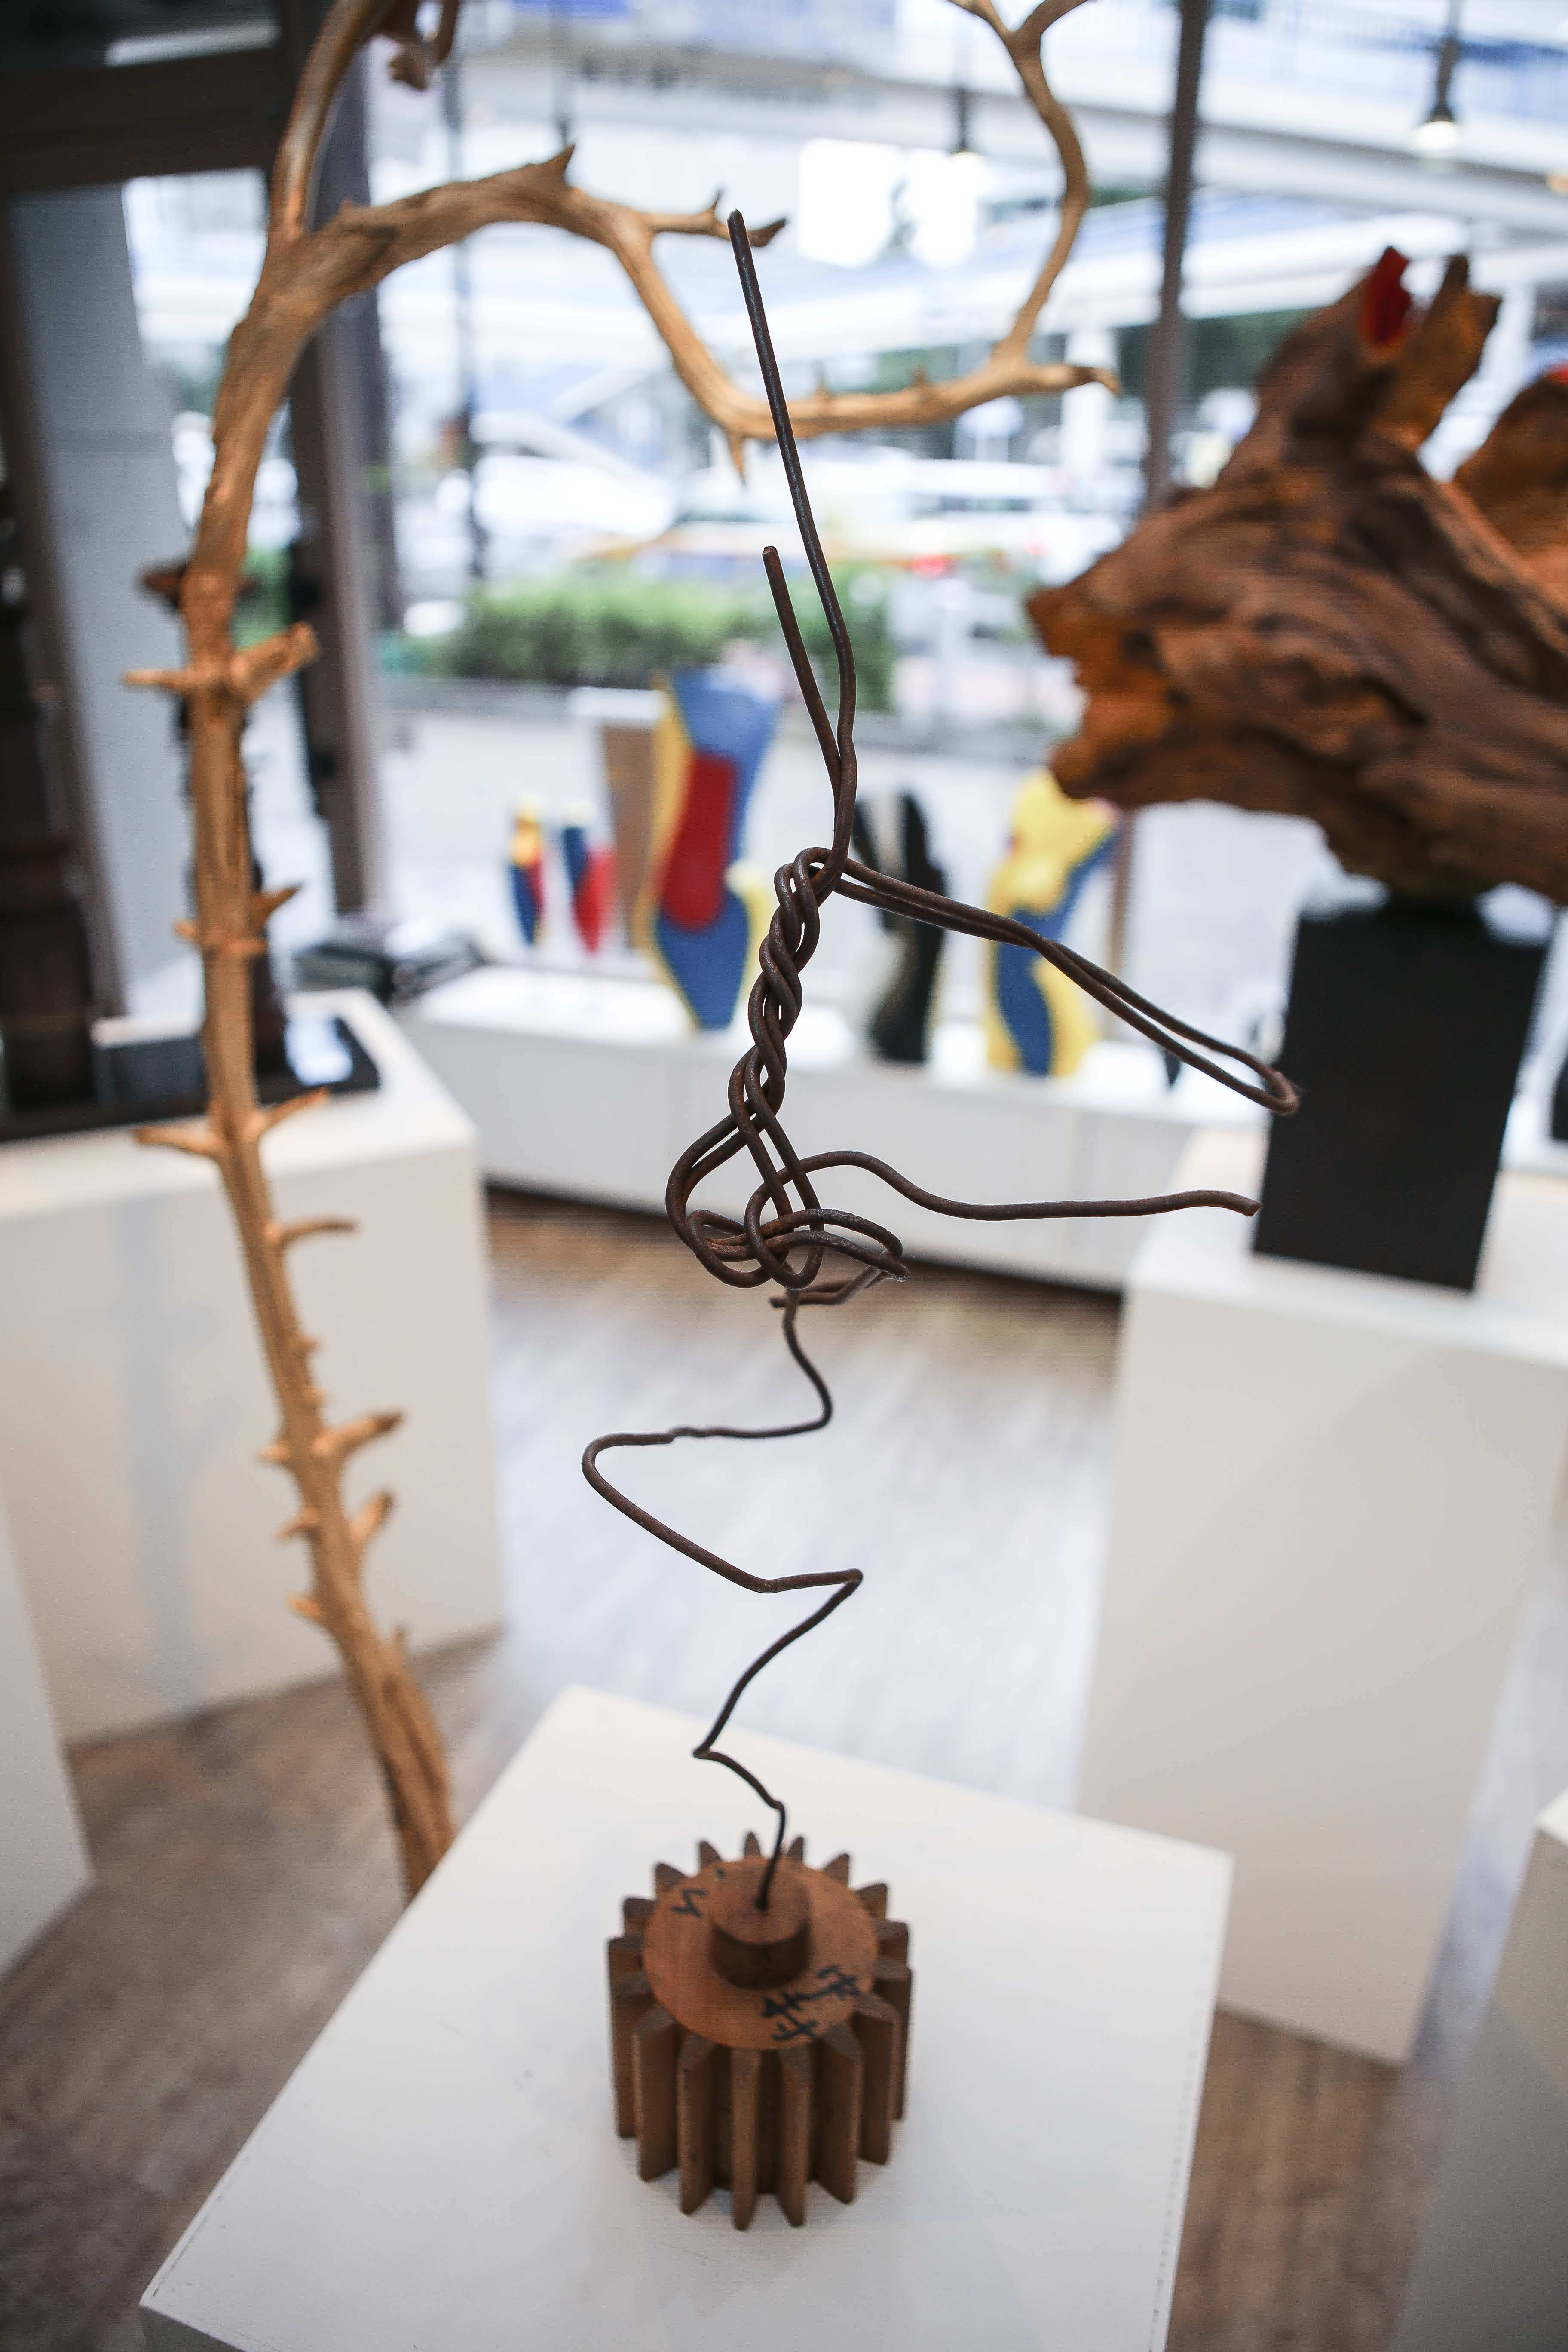 Exhibition Mineo Kuroda